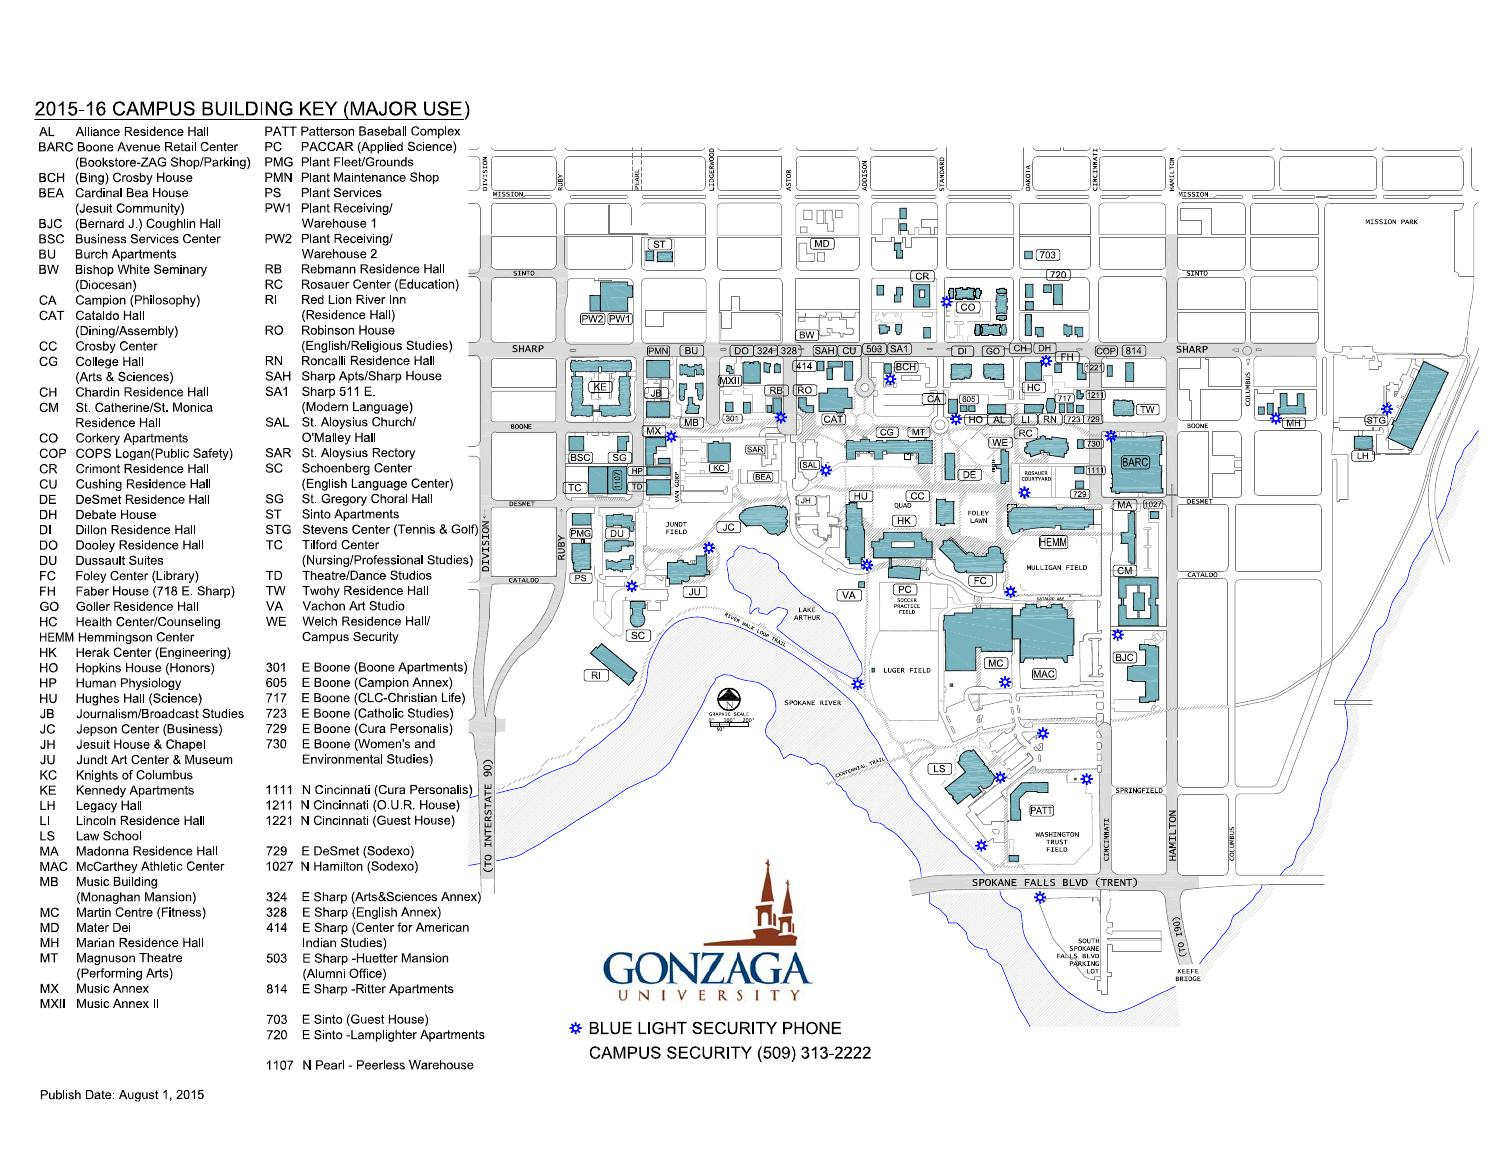 Gonzaga Campus Map 2015 16 By Gonzaga University Issuu